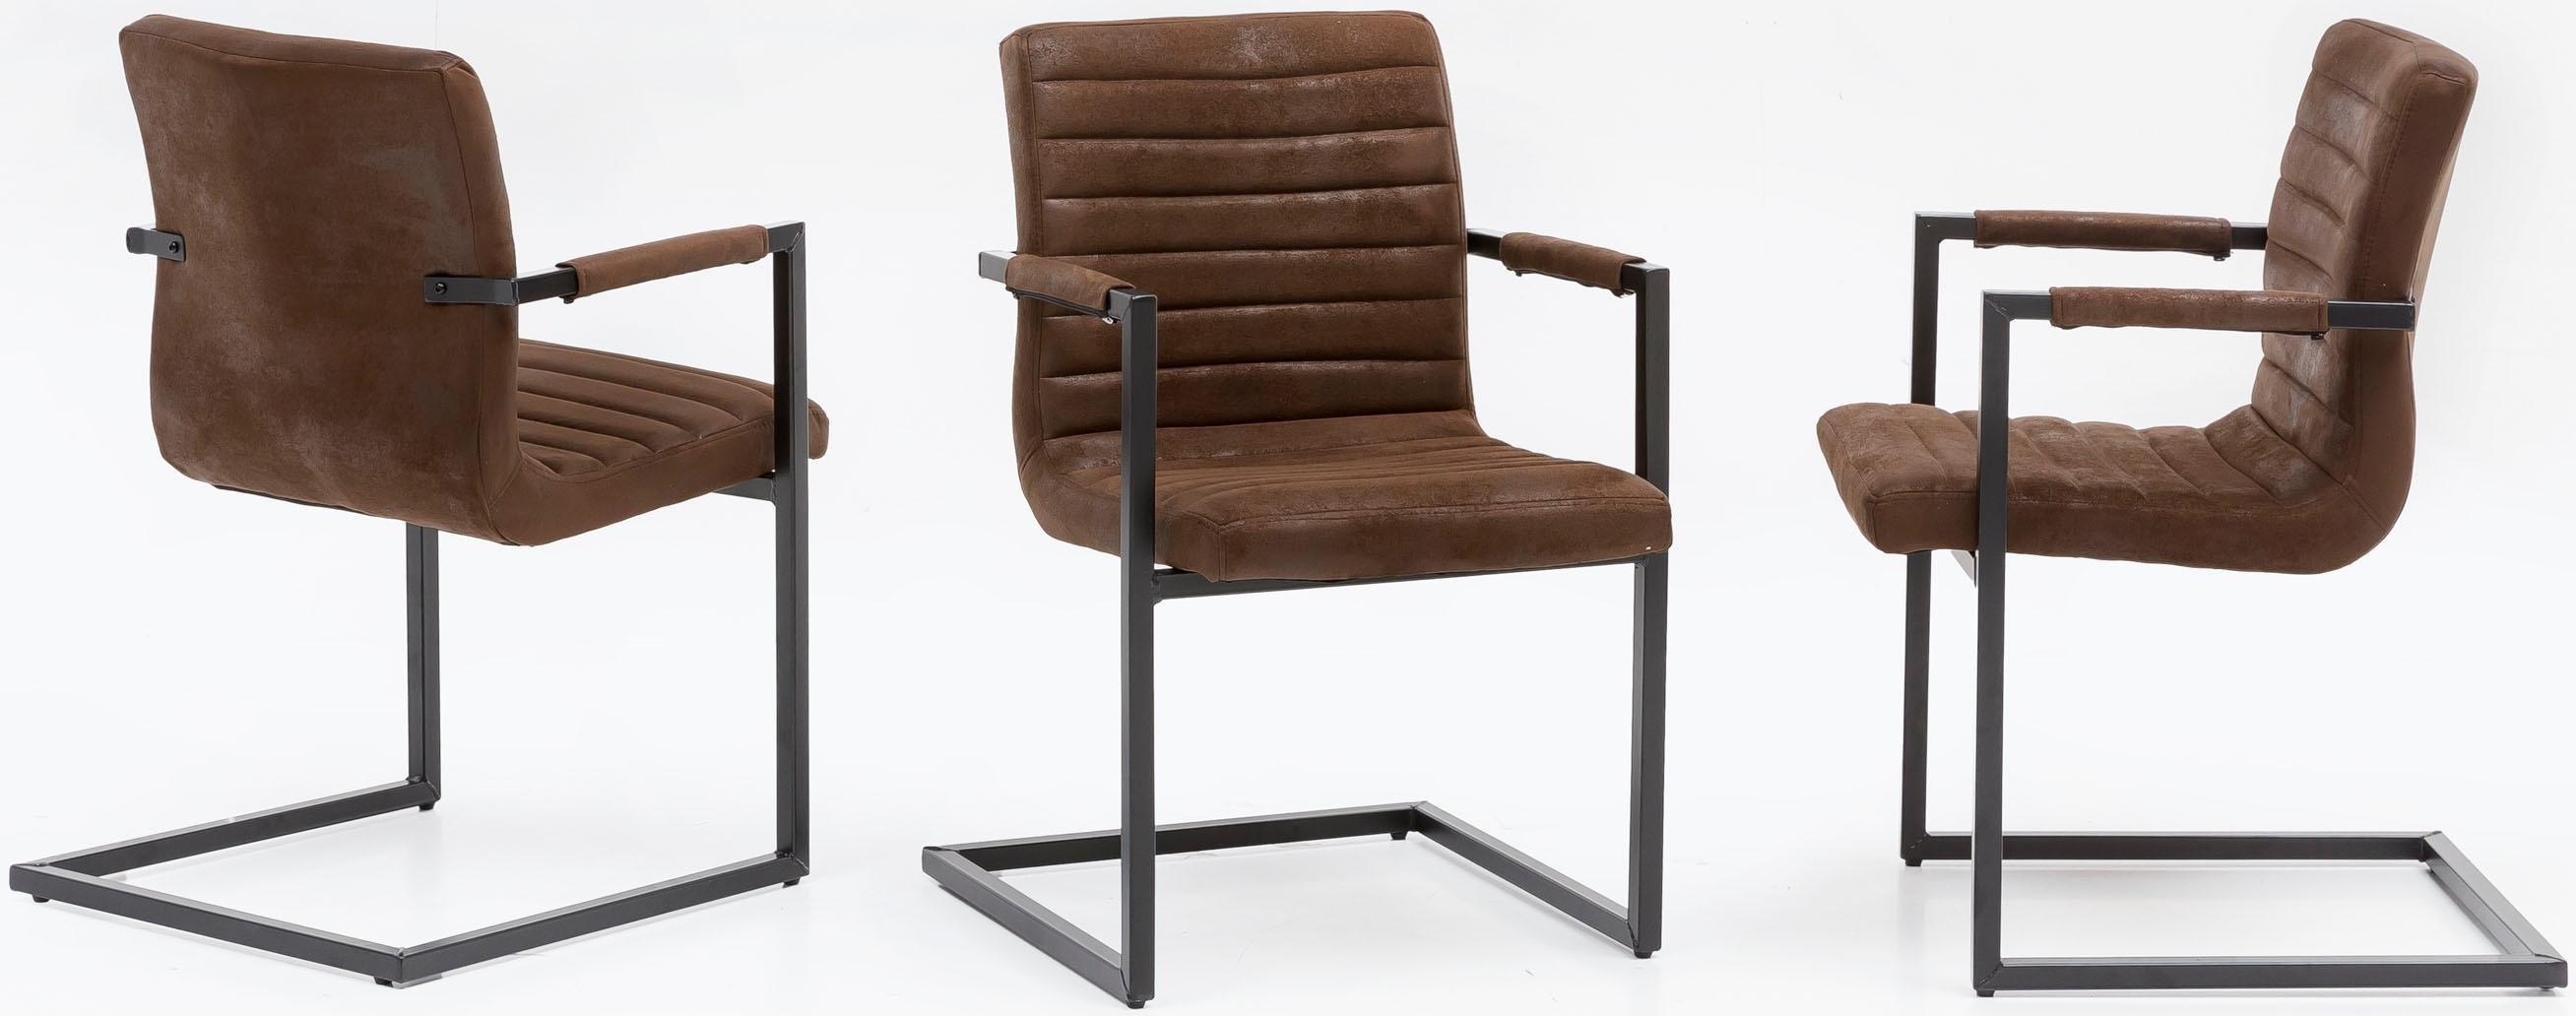 Premium Collection By Home Affaire HOME AFFAIRE Vrijdragende stoel Parzival veilig op otto.nl kopen